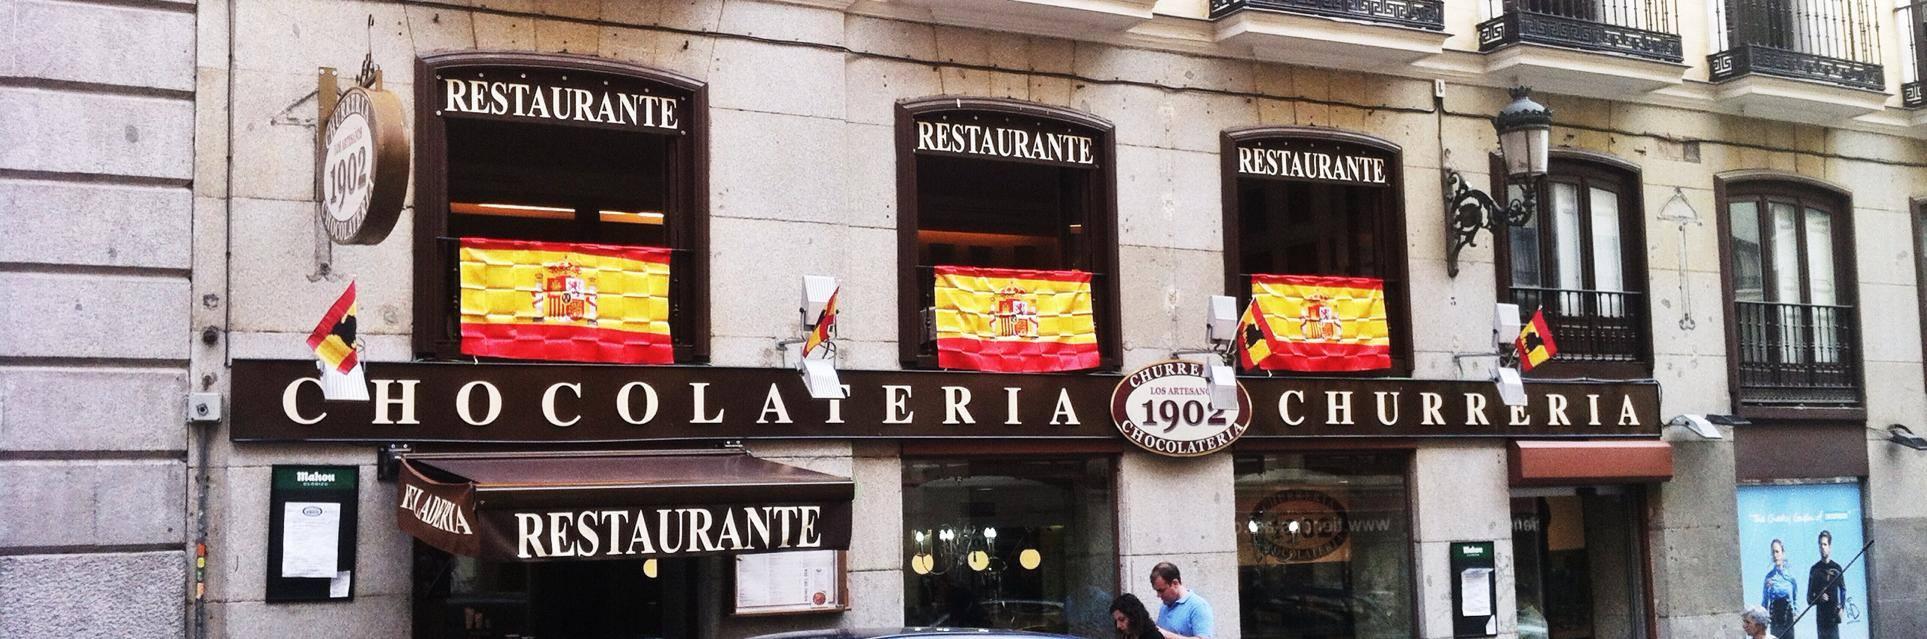 Top les 5 meilleurs churros de madrid - Artesanos de madrid ...